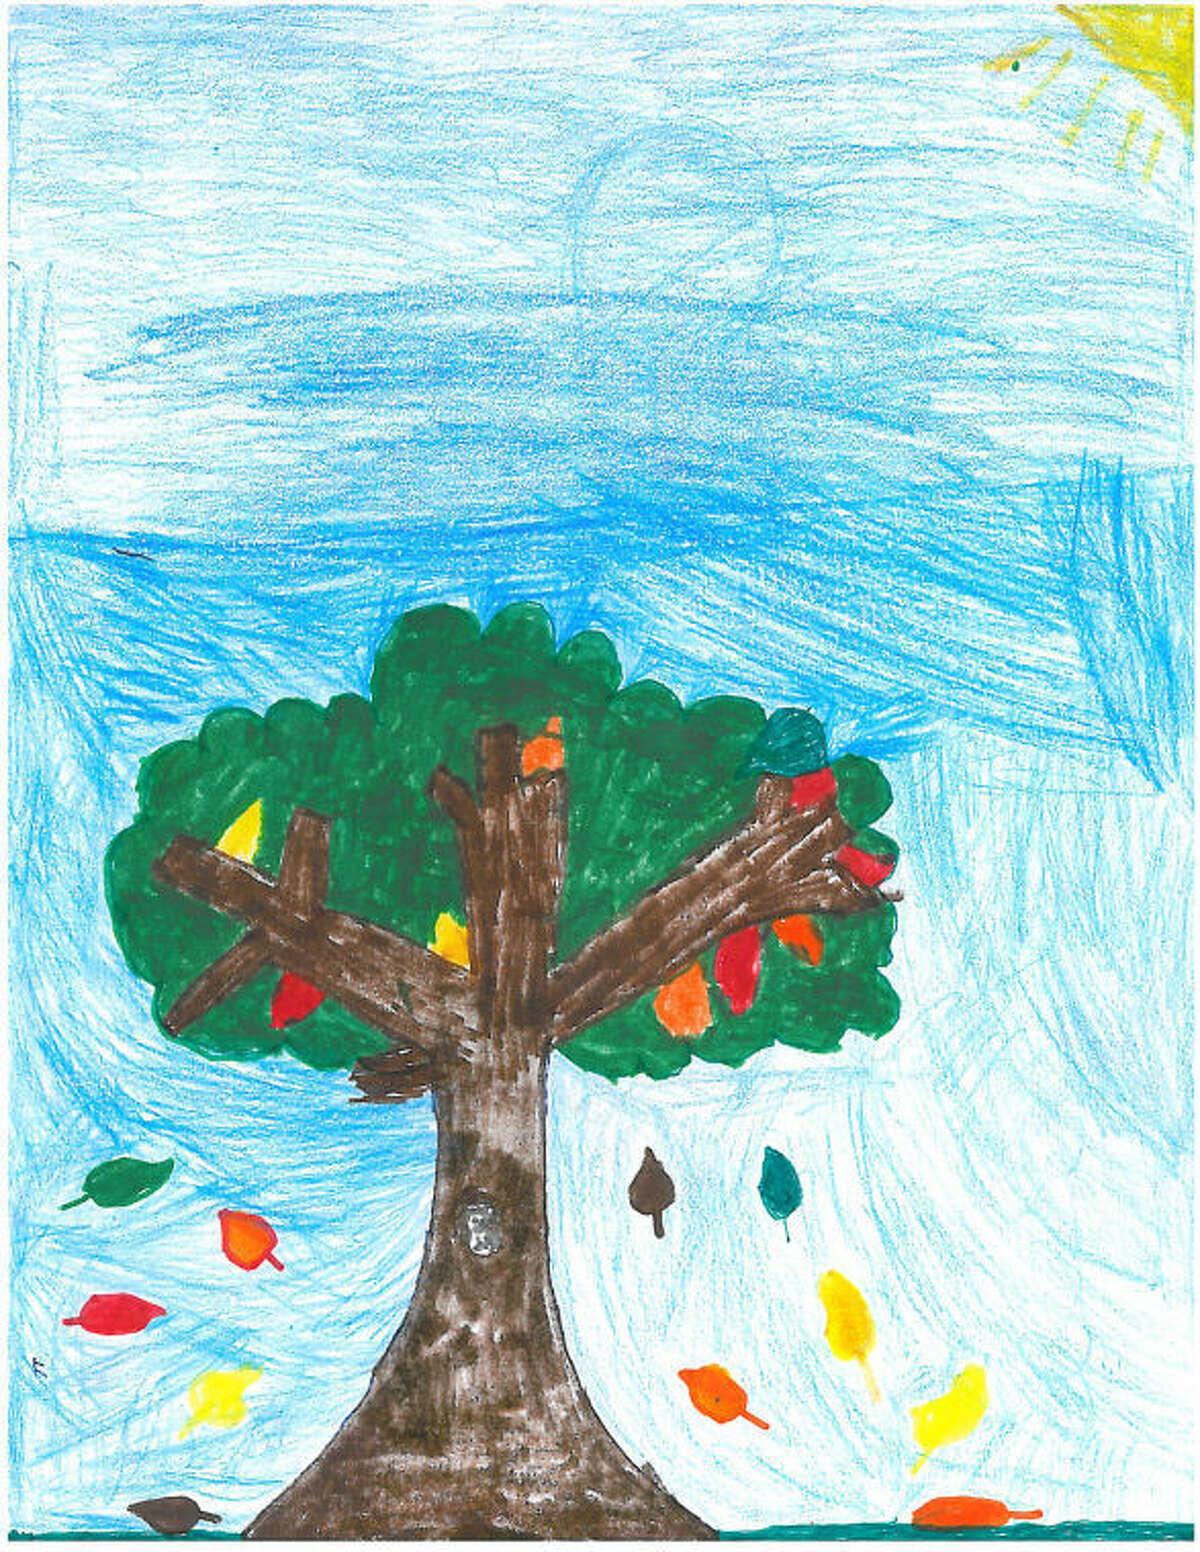 Thomas McGraty & Jaquan Weeks Grade 5 Side by Side Charter School